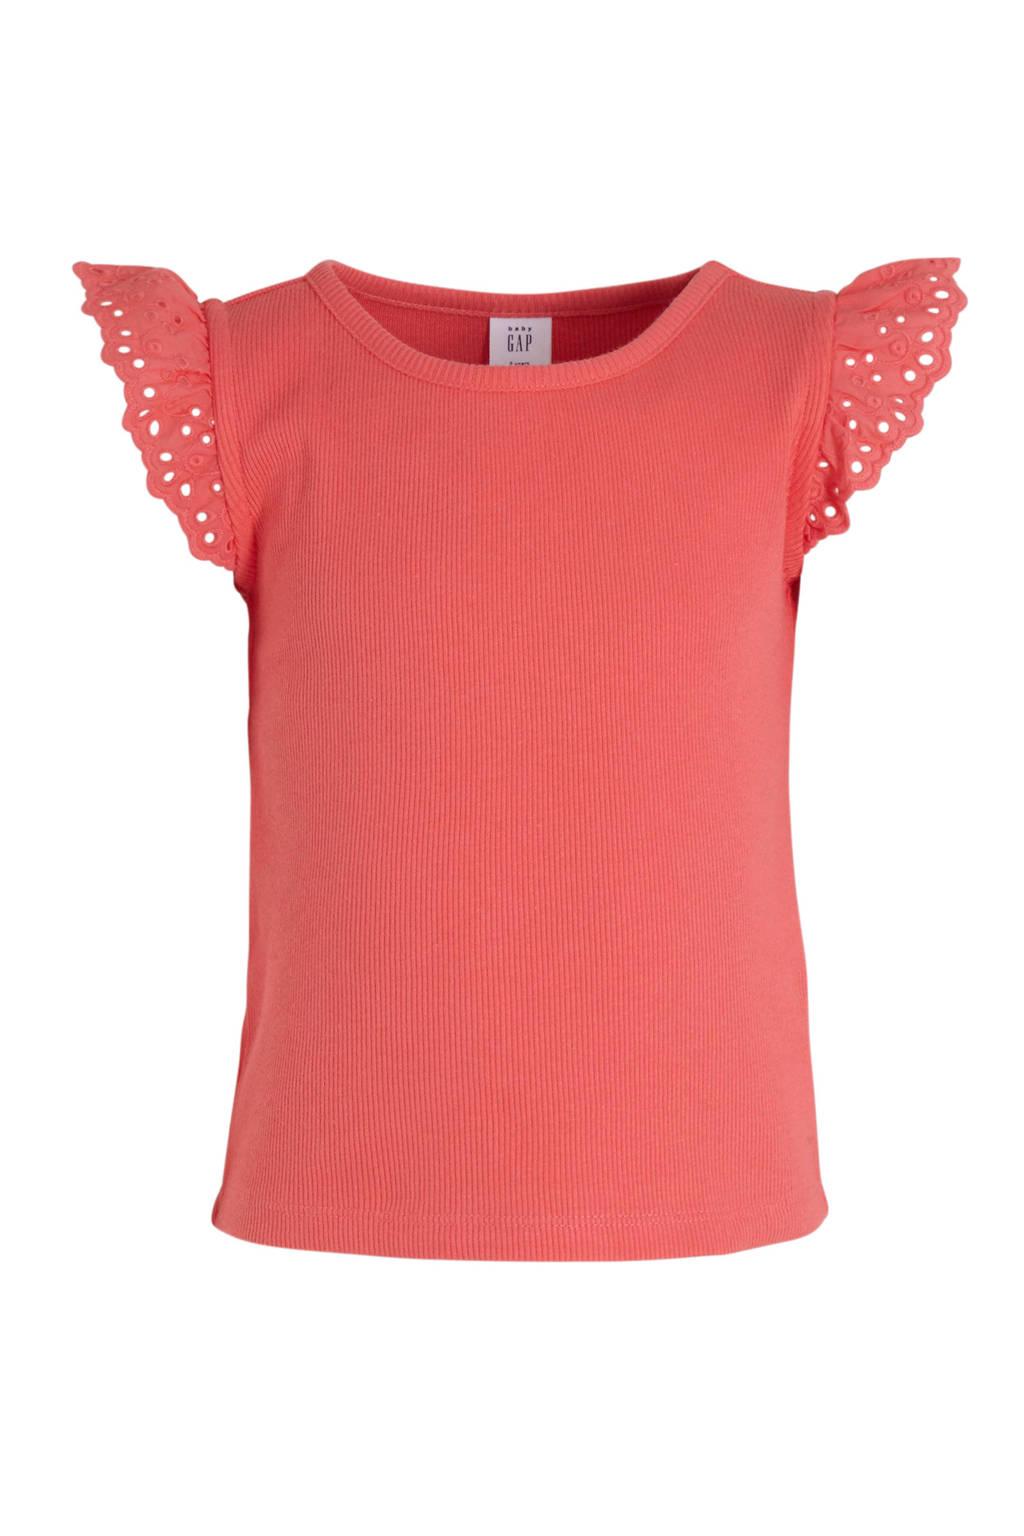 GAP T-shirt koraalrood, Koraalrood